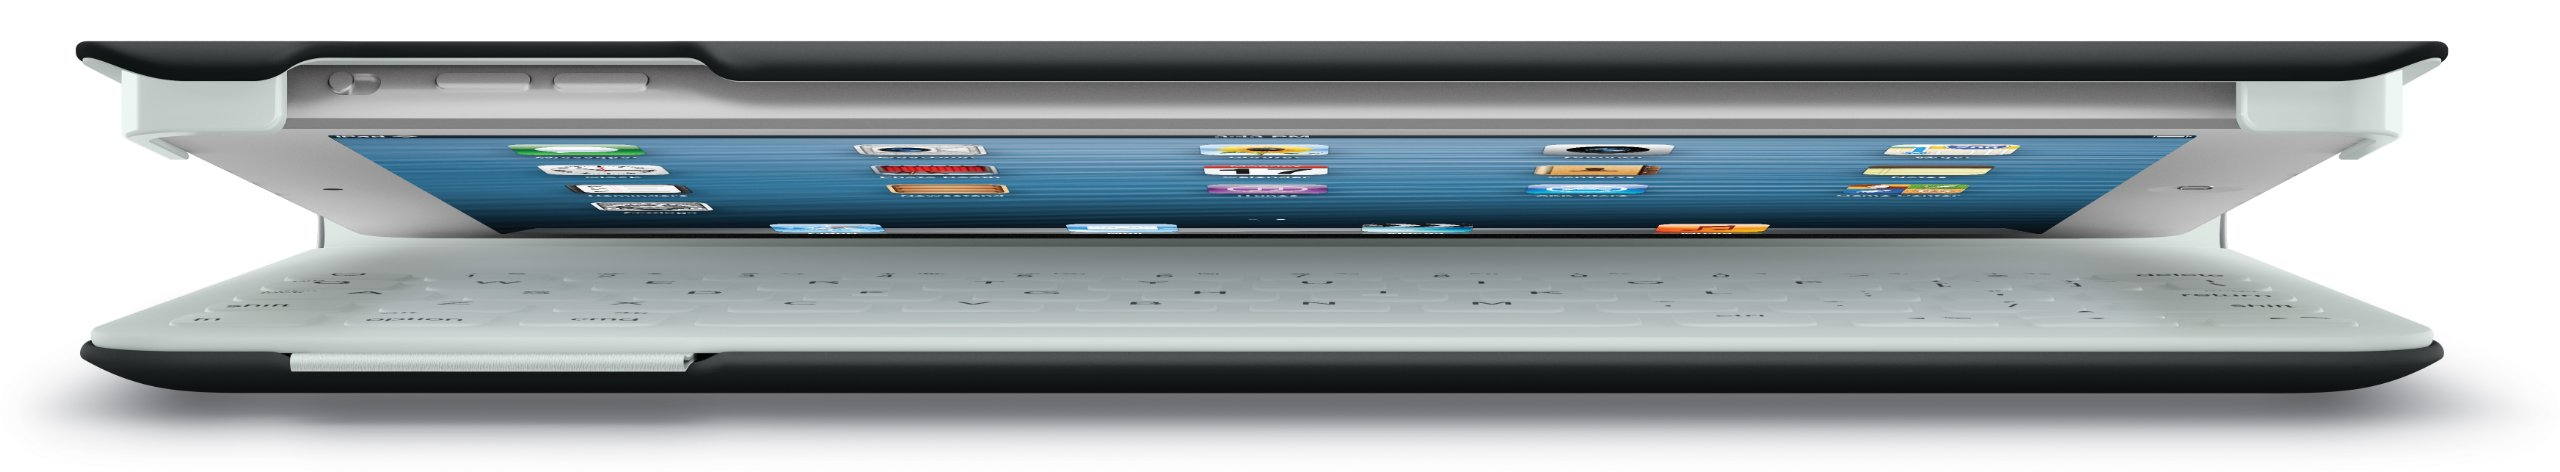 Logitech Fabric Skin Keyboard Folio for iPad Air, Carbon Black